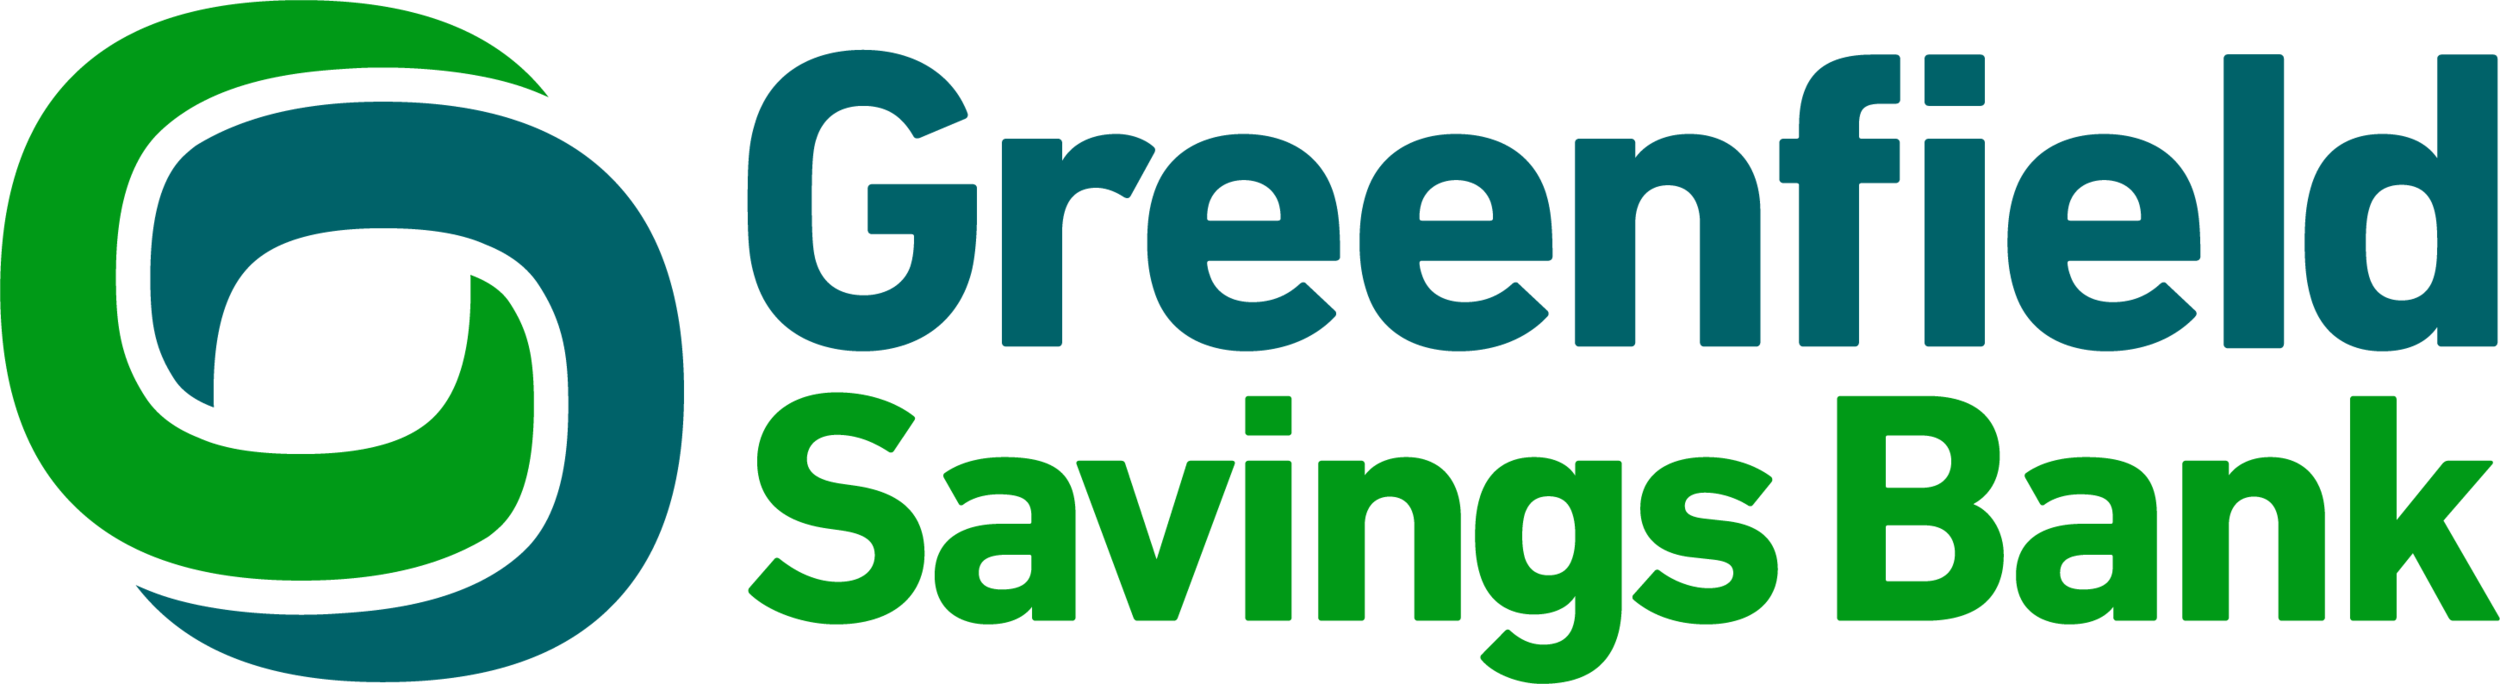 GSB-2017-Logo-Web-RGB-1.png